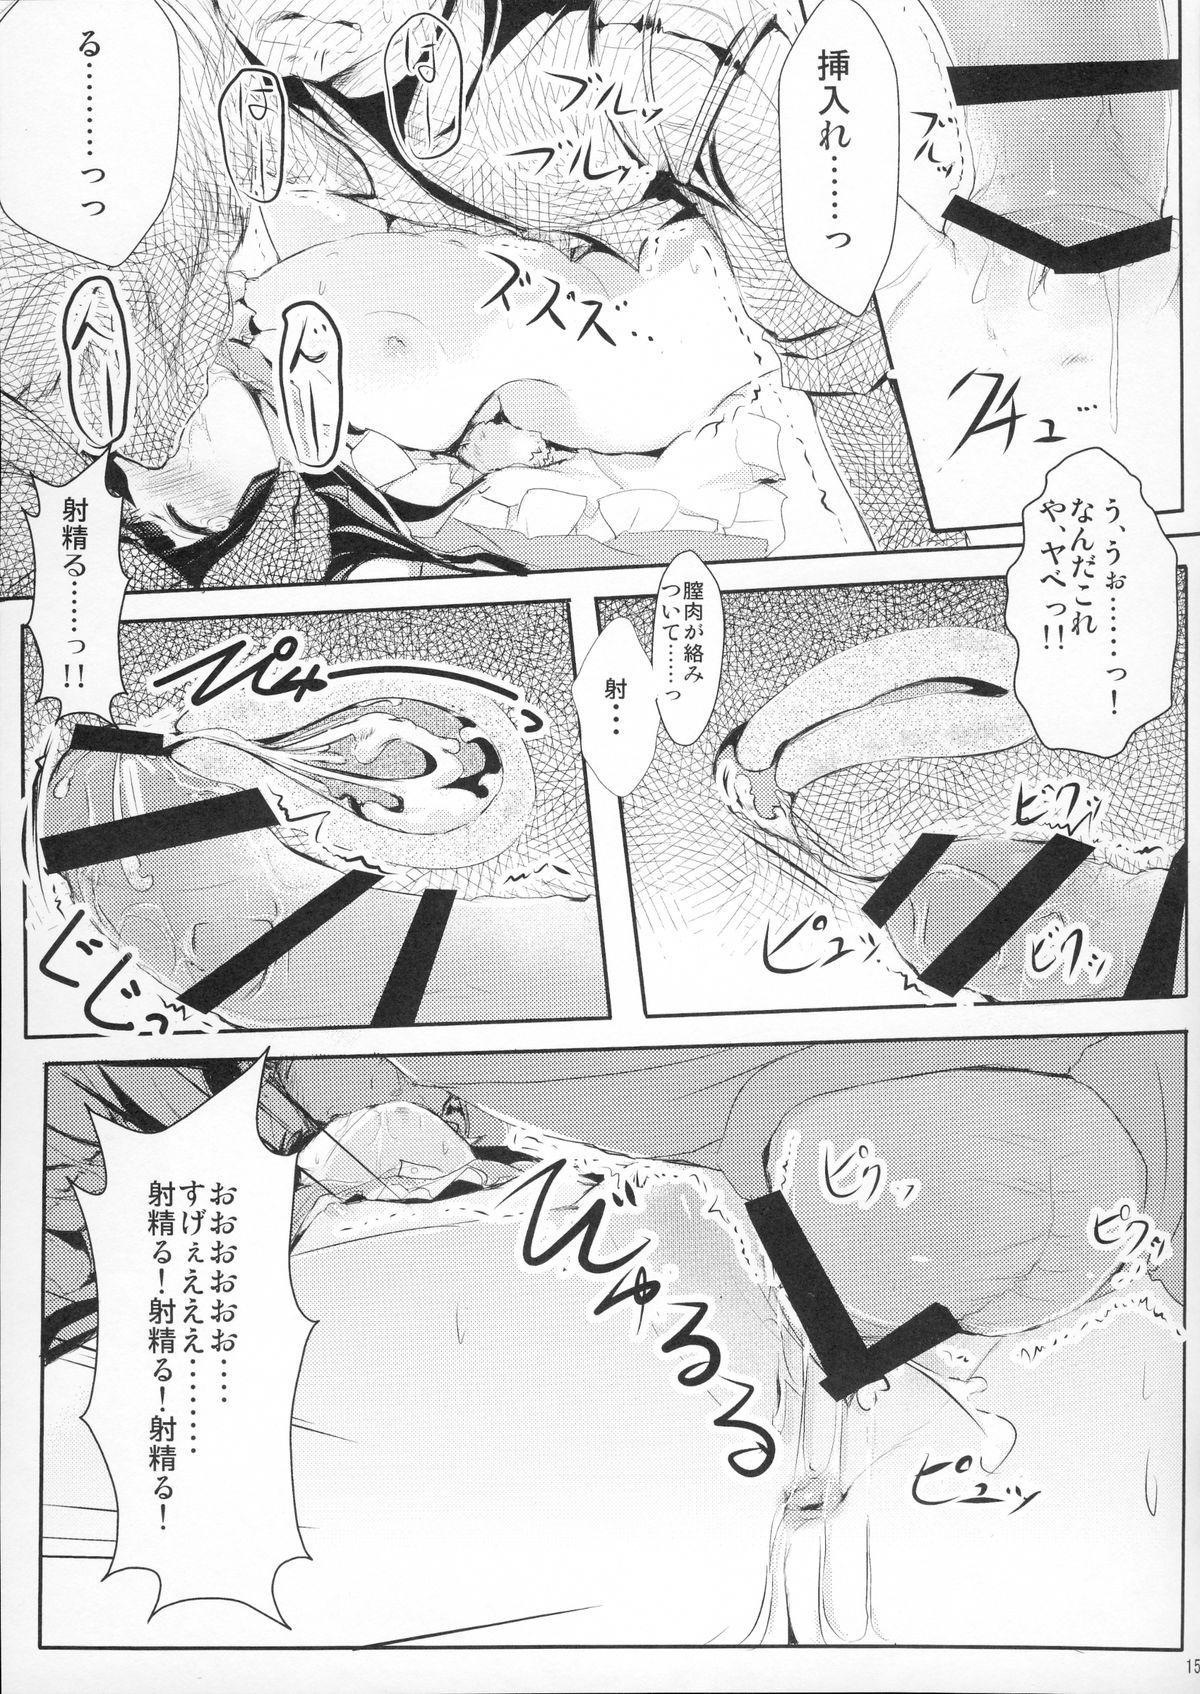 [Mirukomi (PRIMIL)] Human wa Erin-chan ni Hidoi Koto Shitai yo ne - ELIN's the best - (TERA The Exiled Realm of Arborea) 14